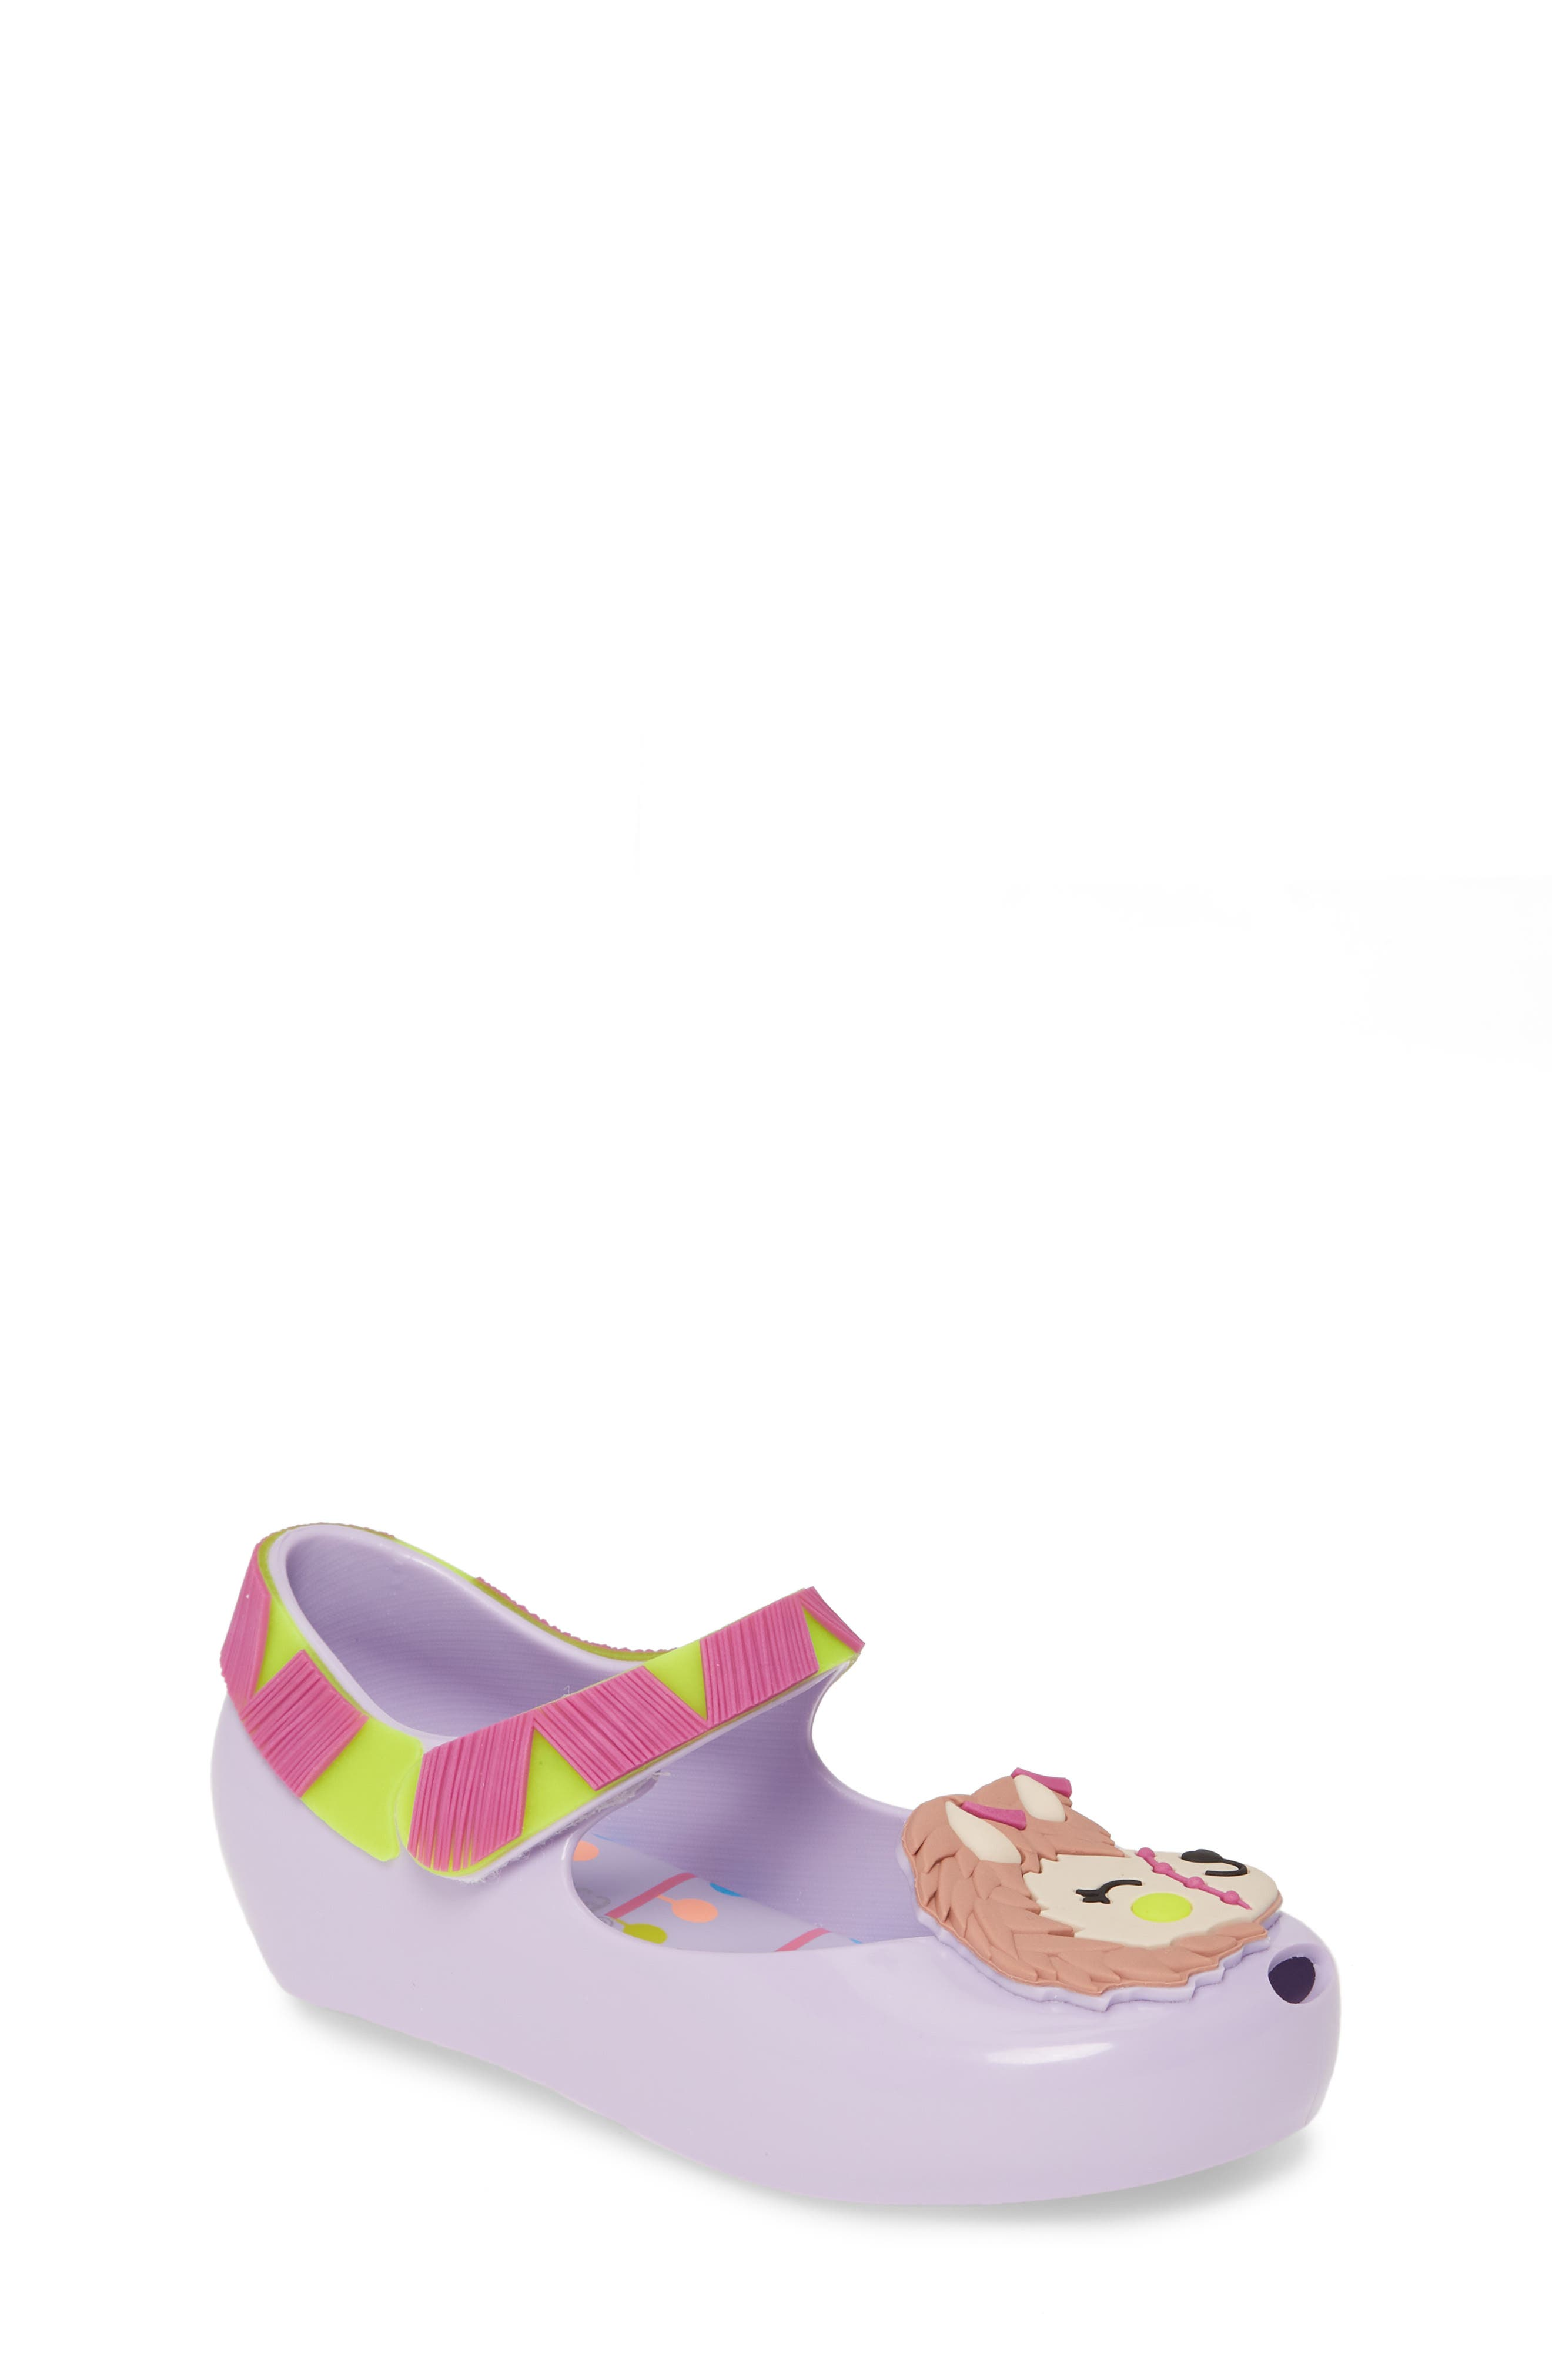 Toddler Girls Melissa Ultra 14 Flat Size 11 M  Purple